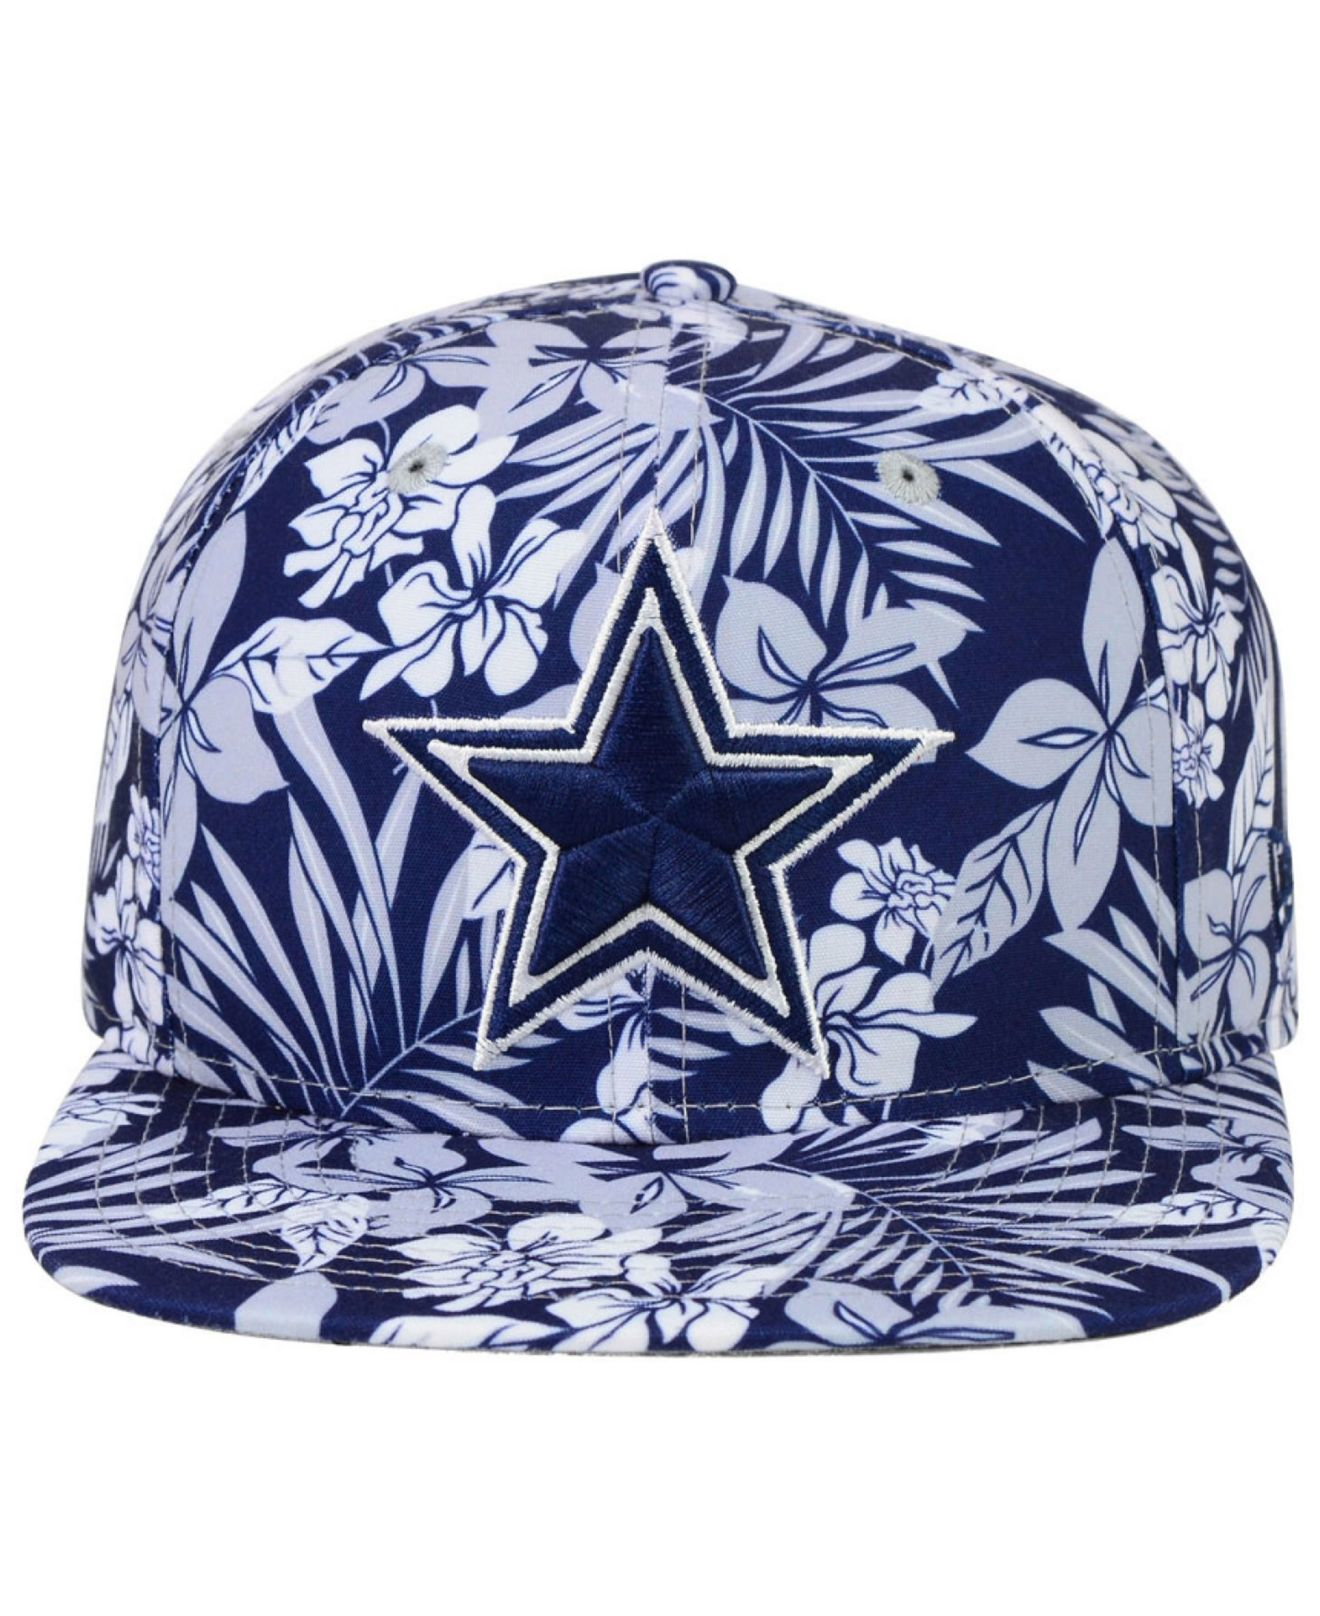 31b5547aa KTZ Gray Dallas Cowboys Wowie Snapback Cap for men